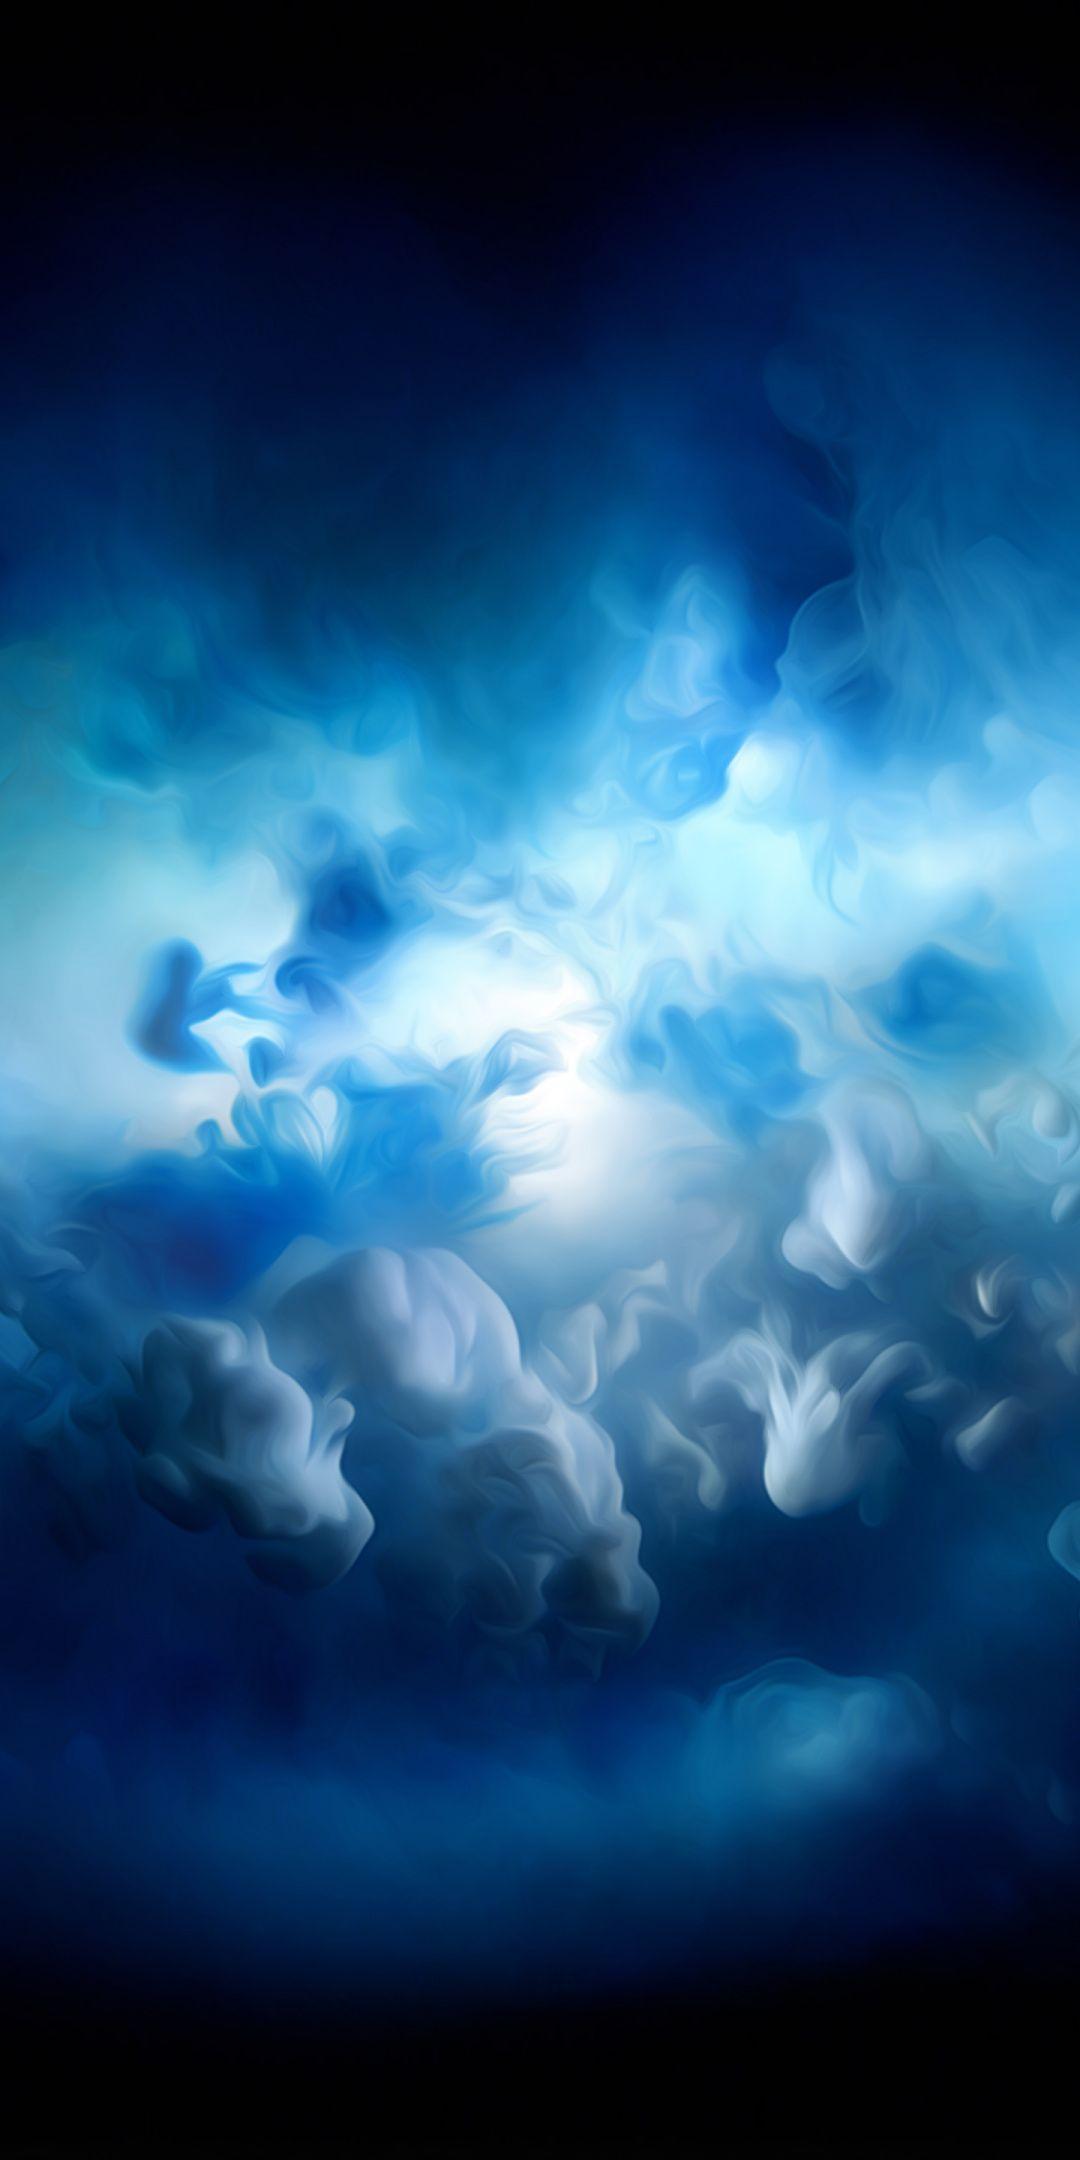 1080x2160 Blue Clouds Stock Wallpaper Stock Wallpaper Clouds Beautiful Wallpaper Hd